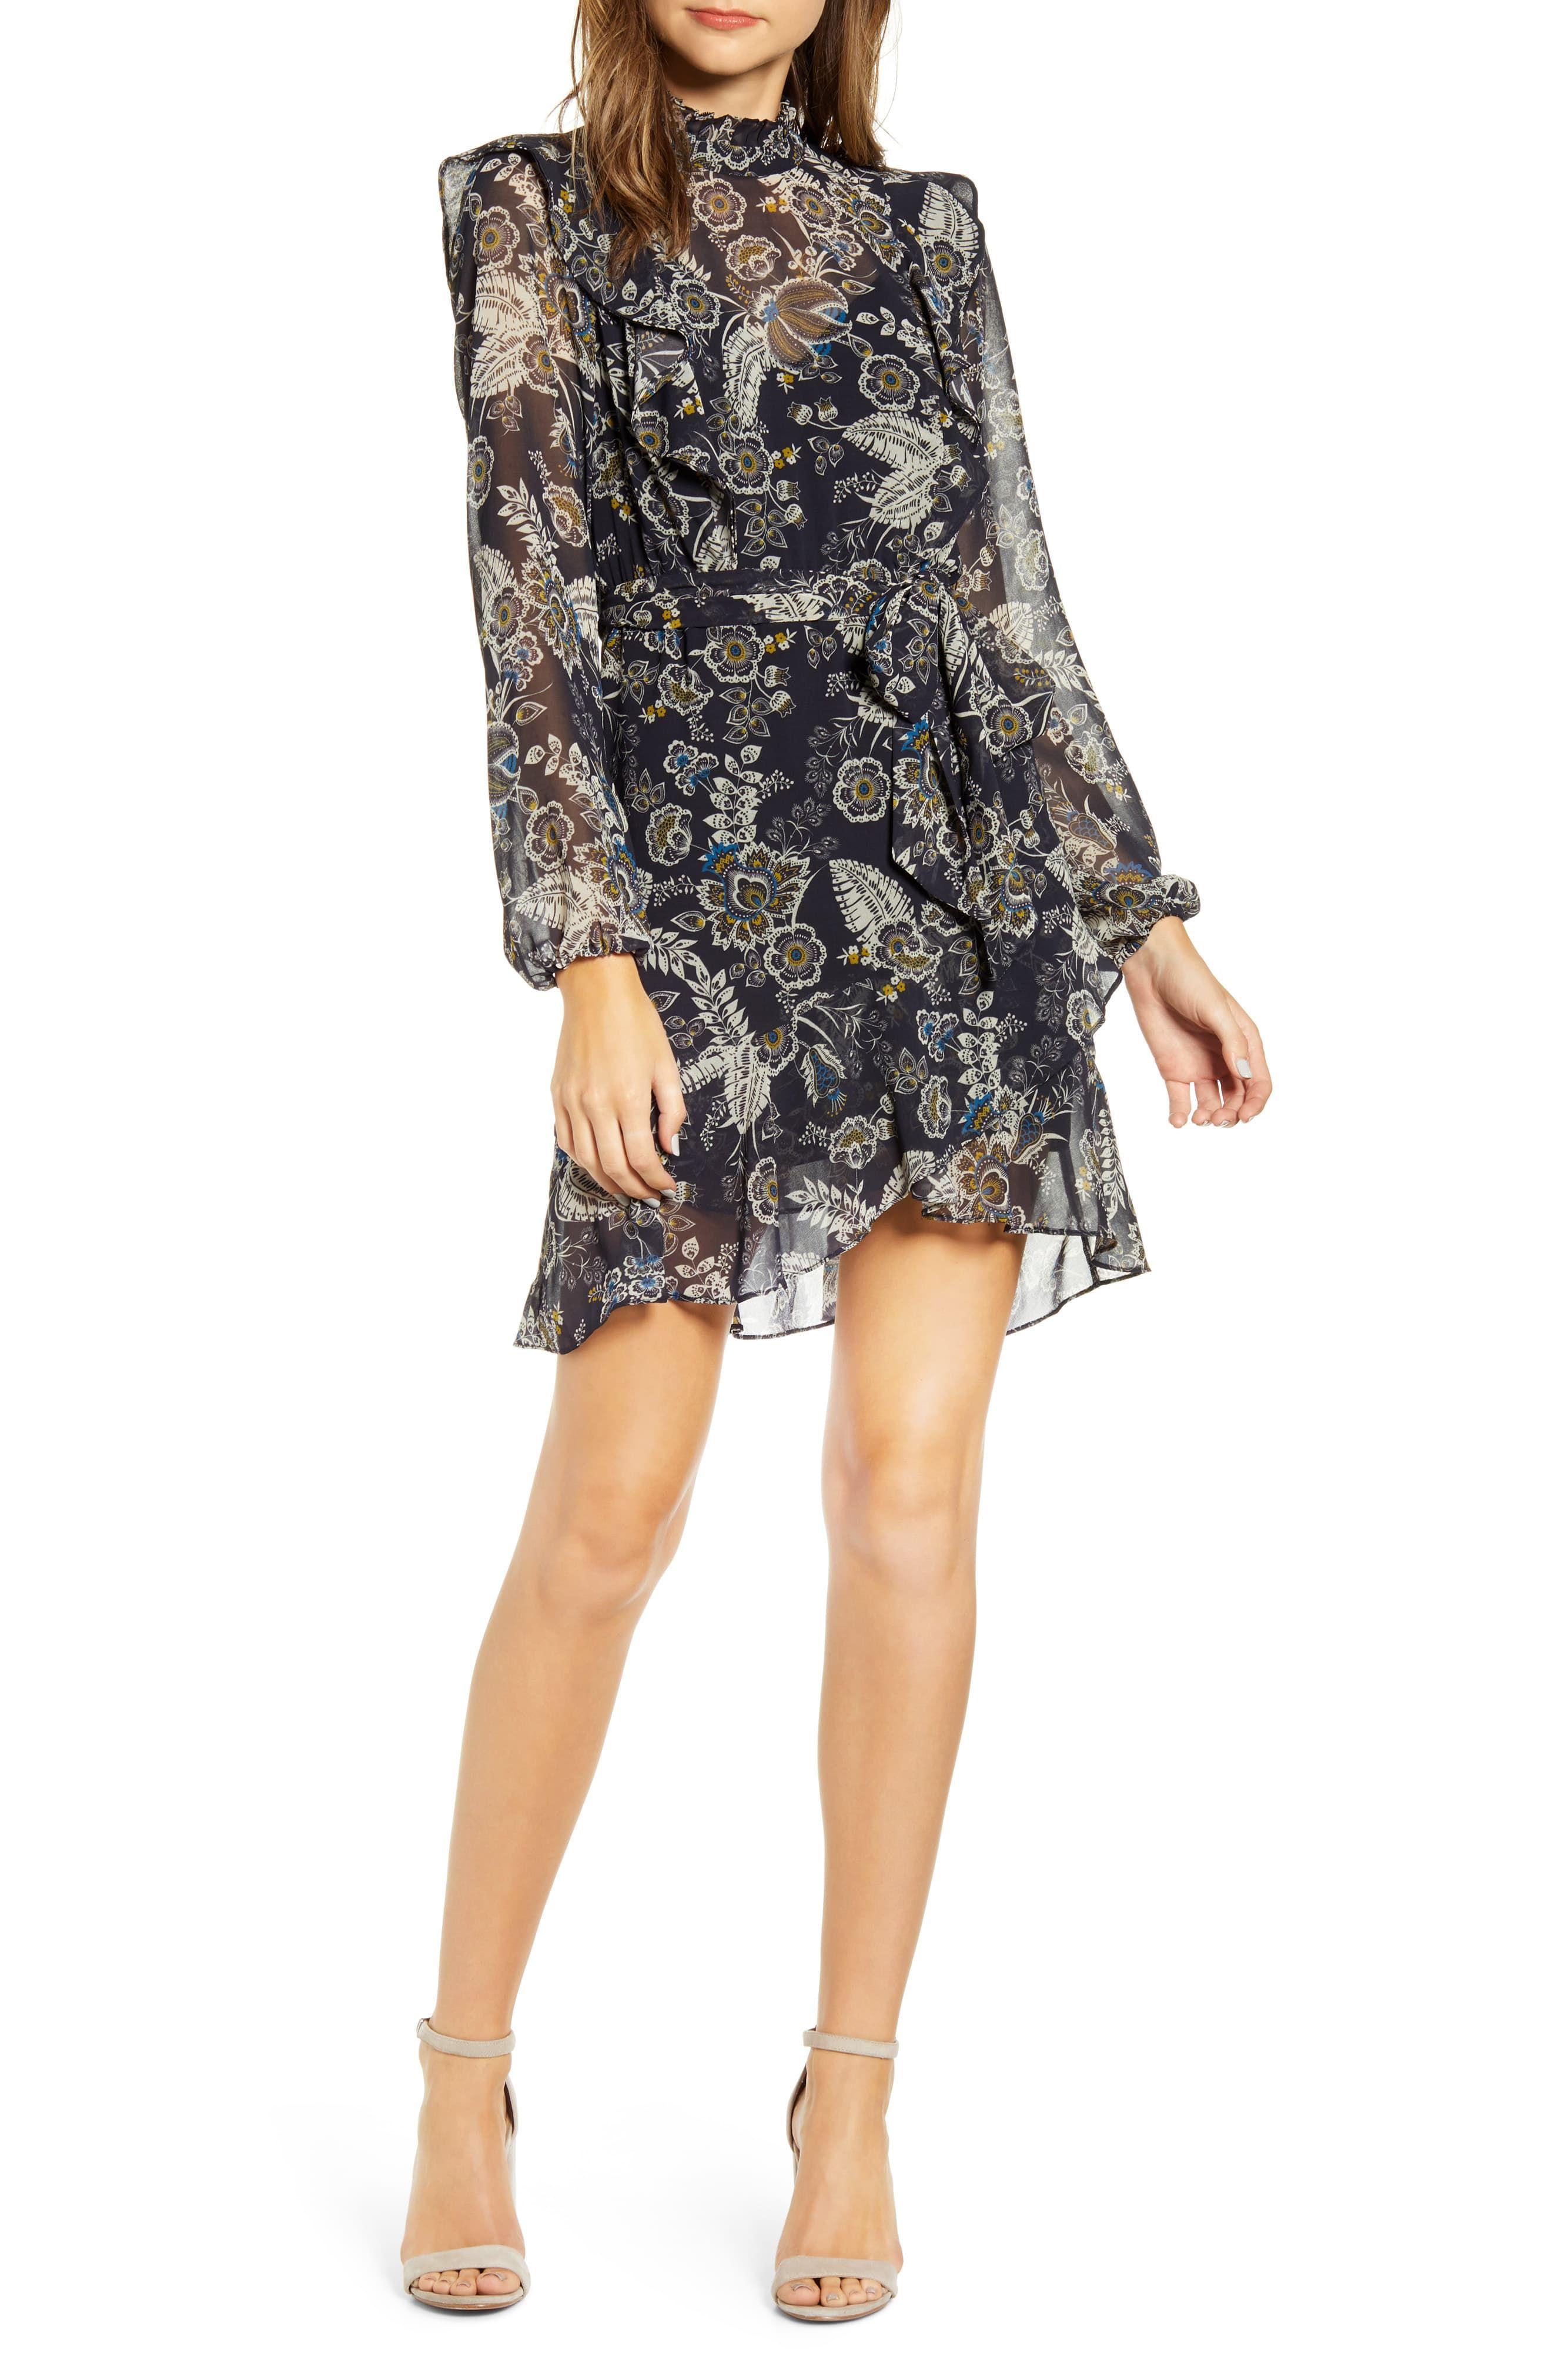 Bailey 44 Viola Floral Ruffle Long Sleeve Chiffon Minidress Available At Nordstrom Chiffon Long Sleeve Mini Dress Fashion Clothes Women [ 4048 x 2640 Pixel ]